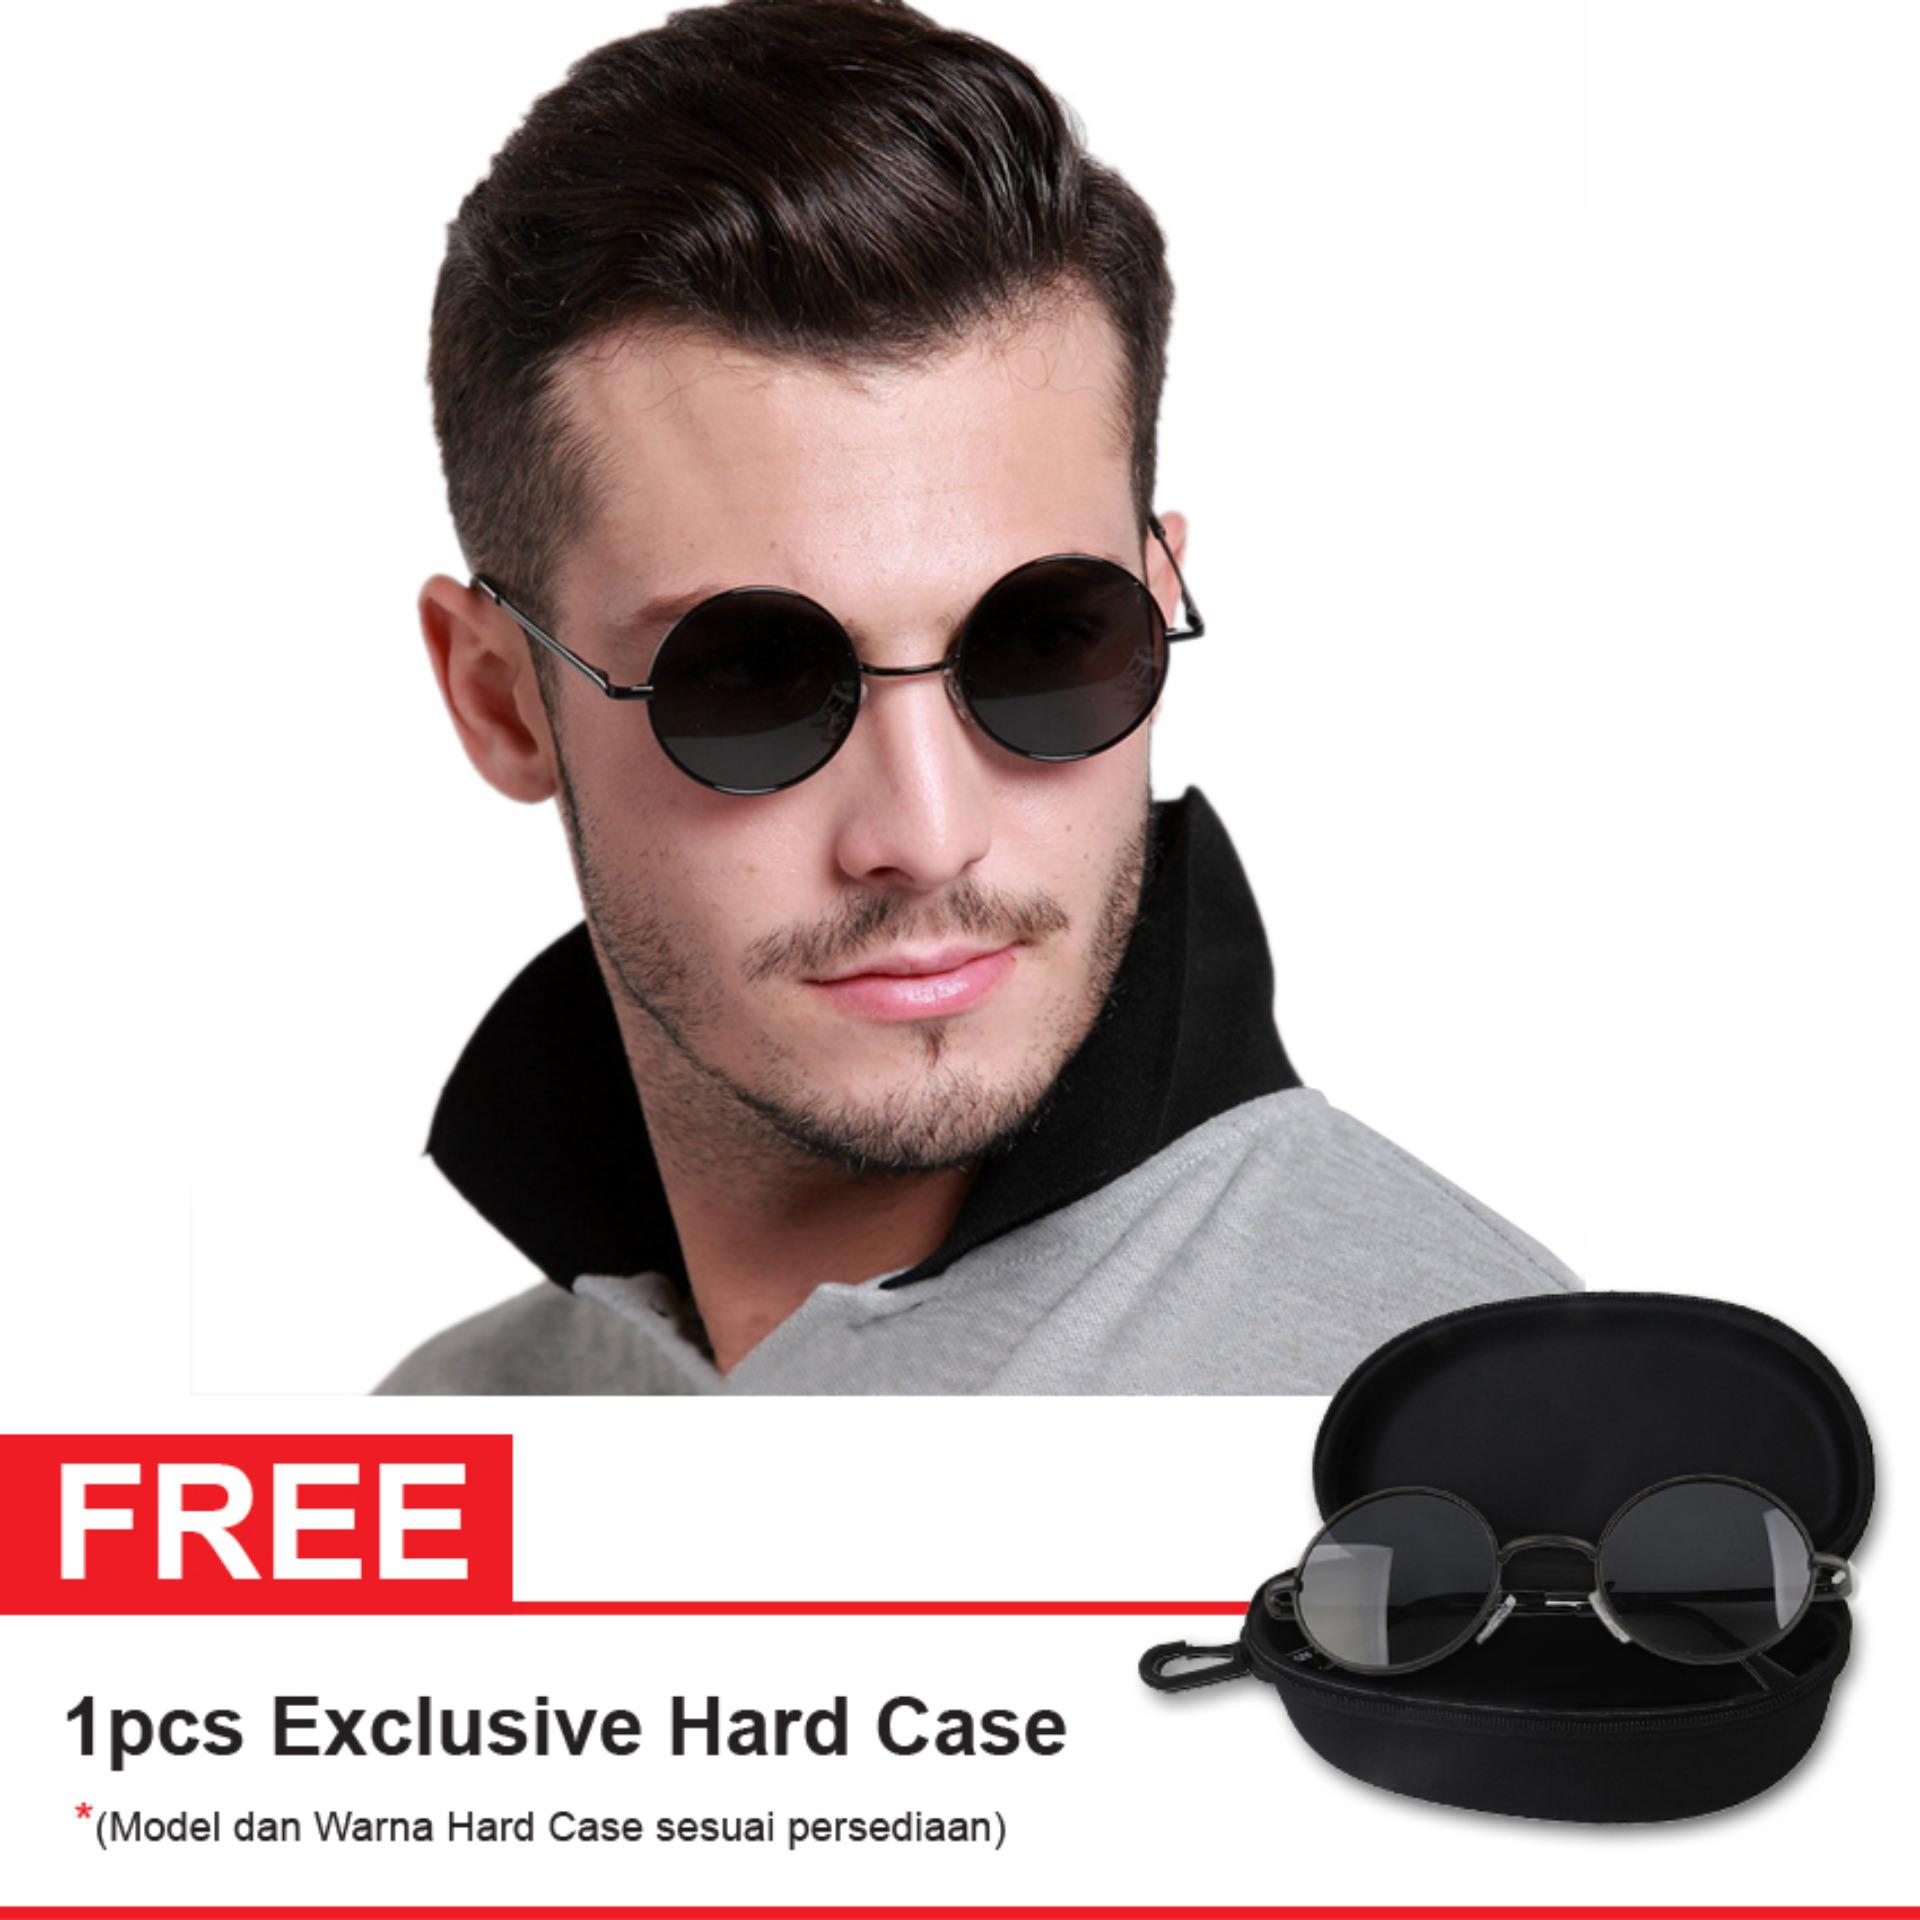 Polarized Sunglasses UV 400 HD Night 002 810 ROUND Free Exclusive Hard Case  - Kacamata Pria 3356fbe7a7